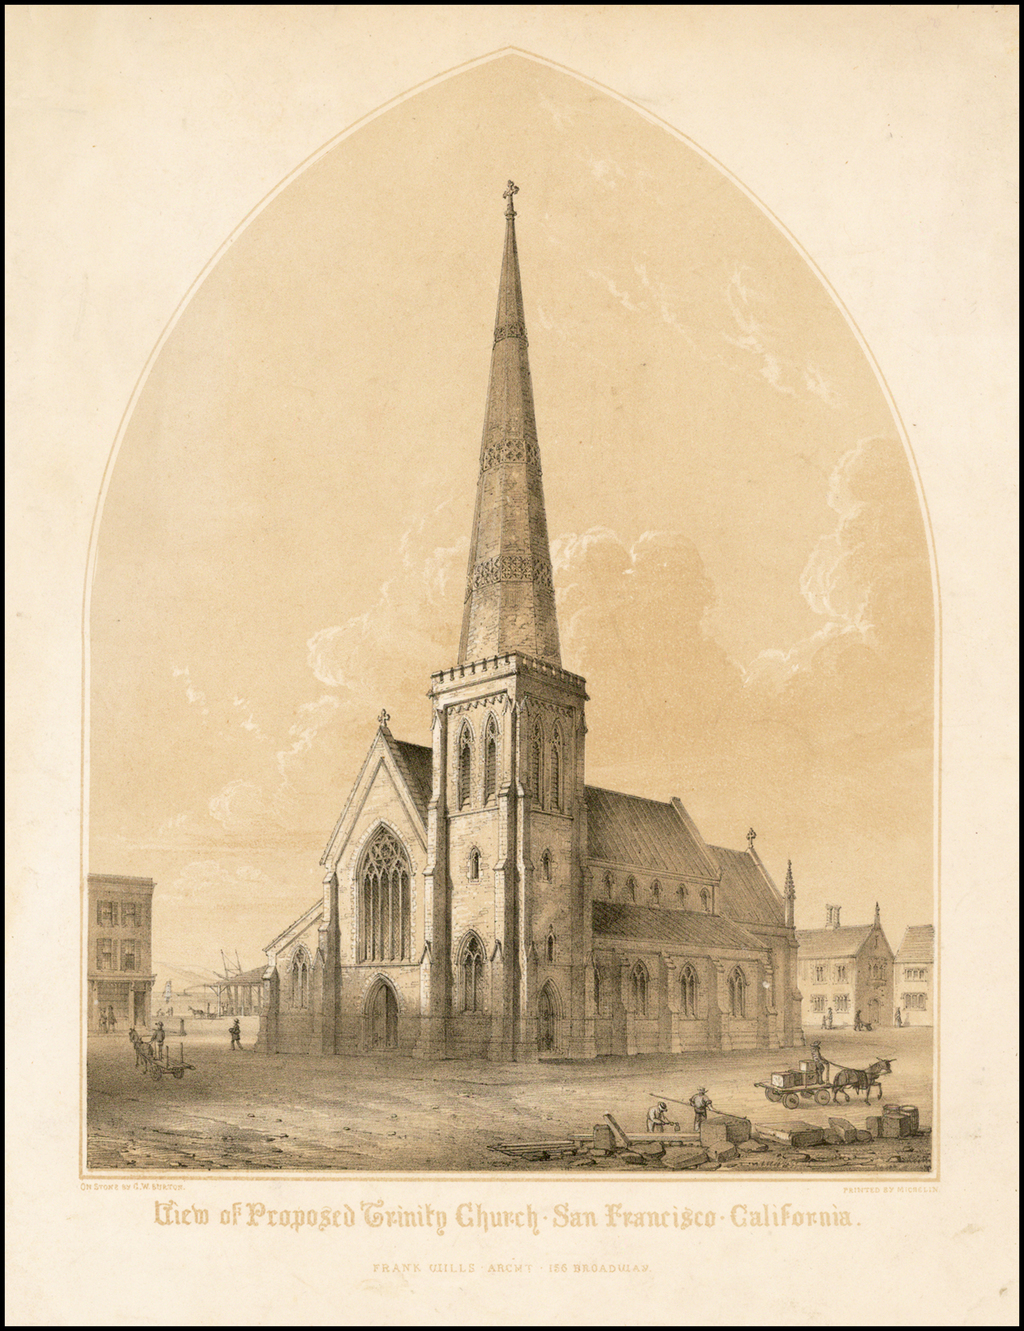 View of Proposed Trinity Church - San Francisco - California.  . . . By G.W. Burton